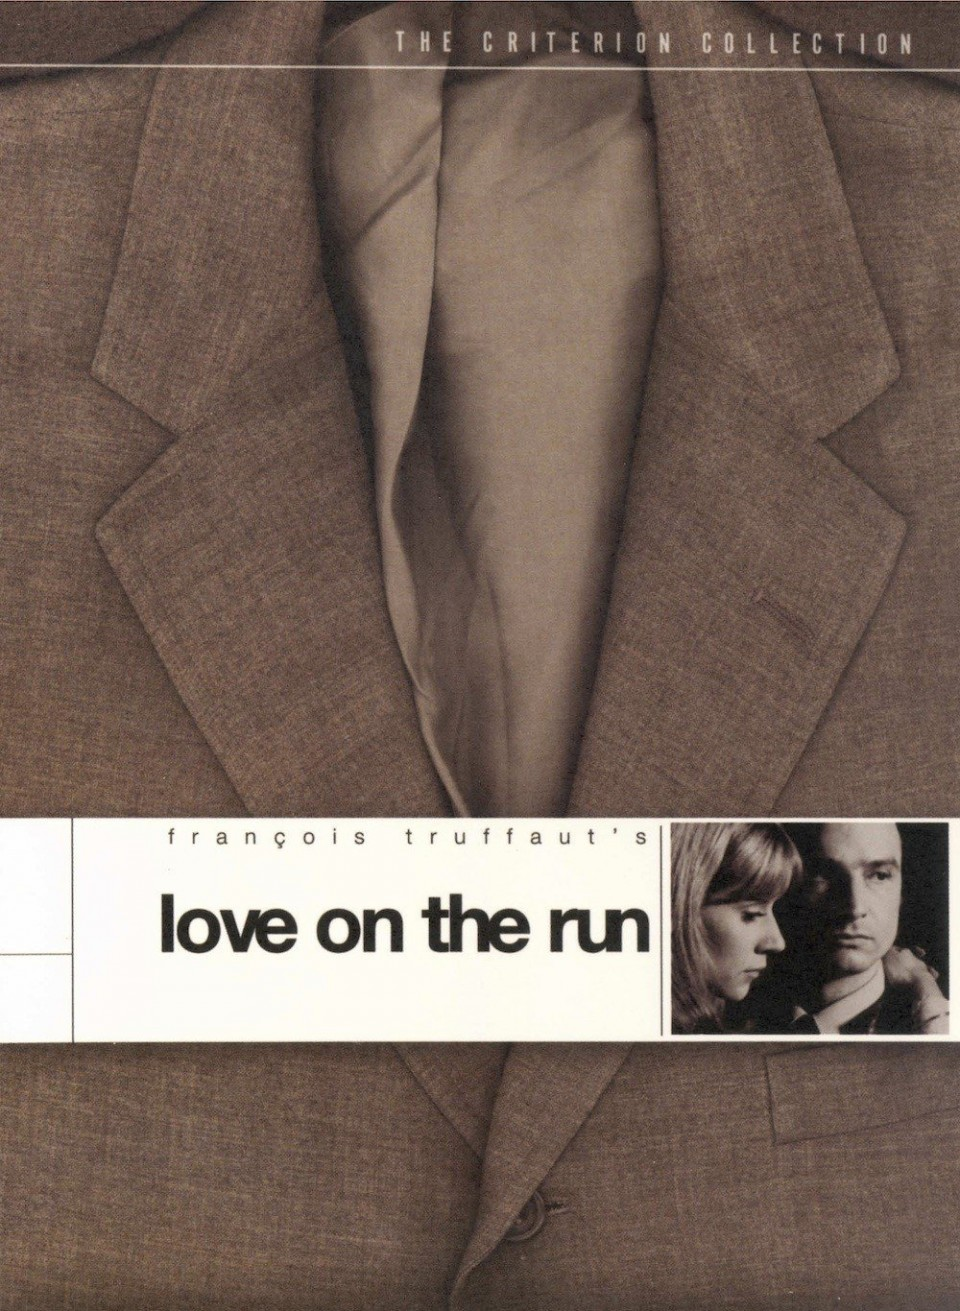 L'amore fugge